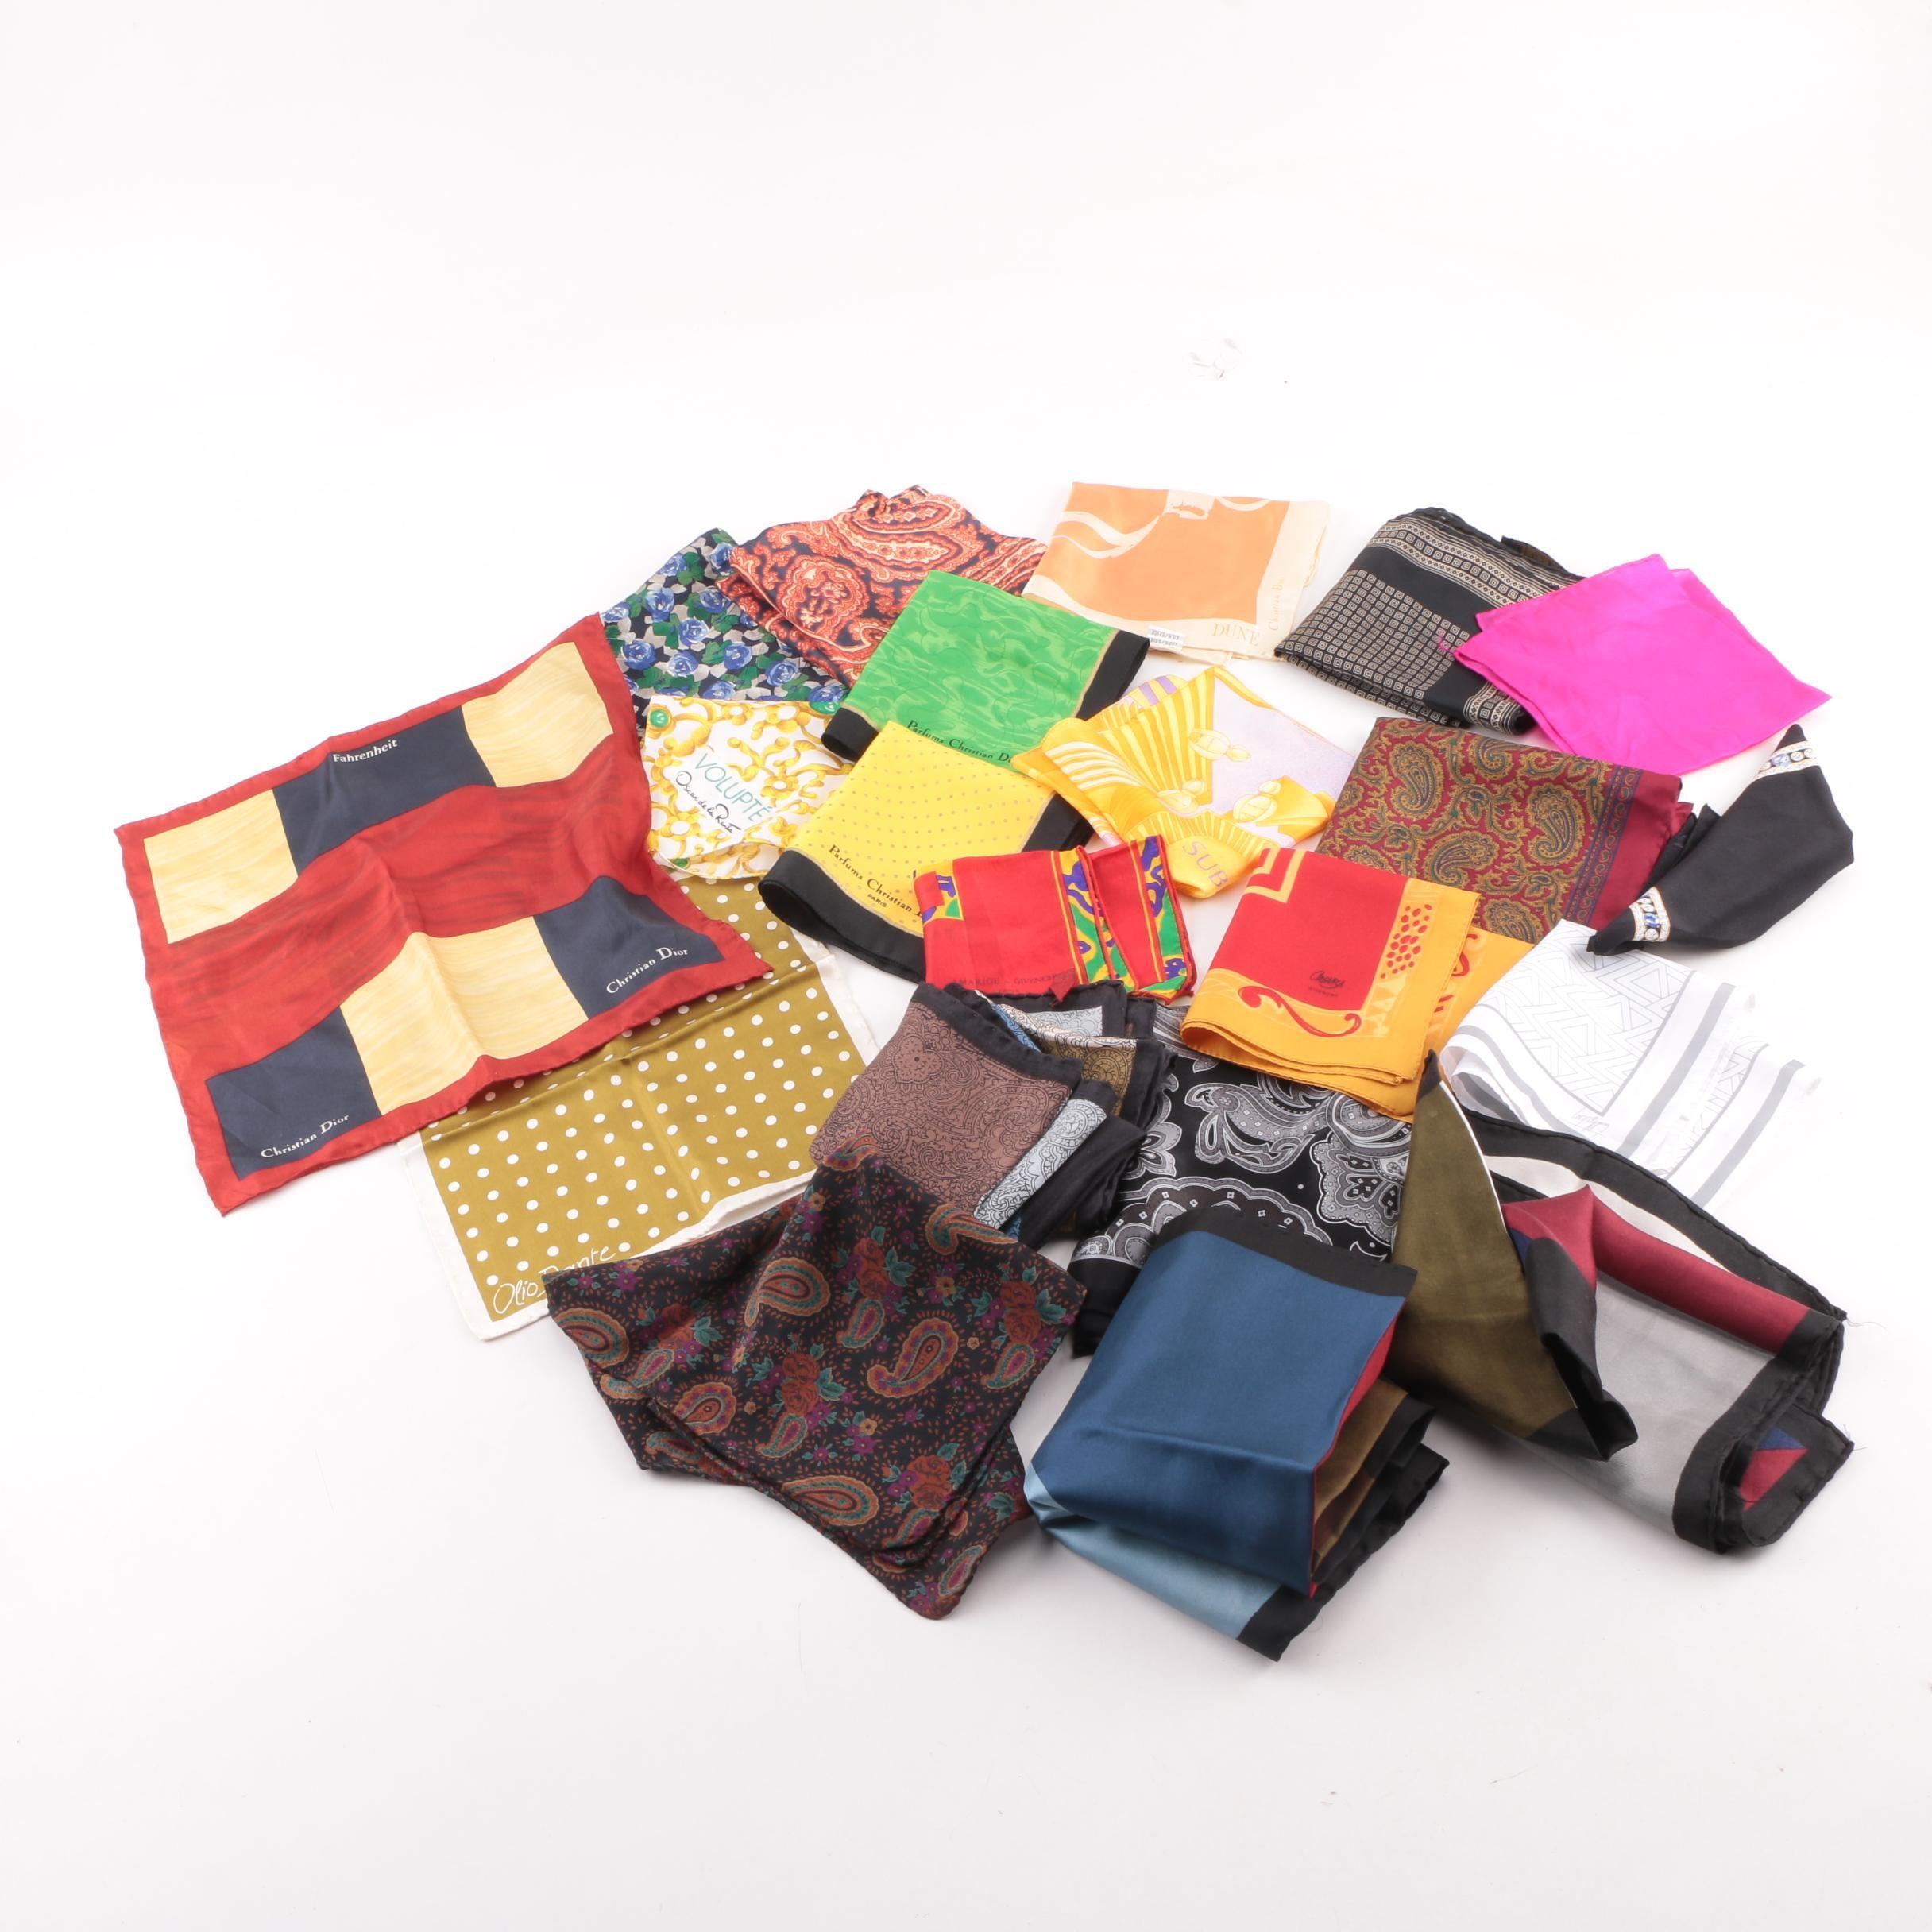 Christian Dior, Oscar de la Renta and Other Handkerchiefs and Pocket Squares